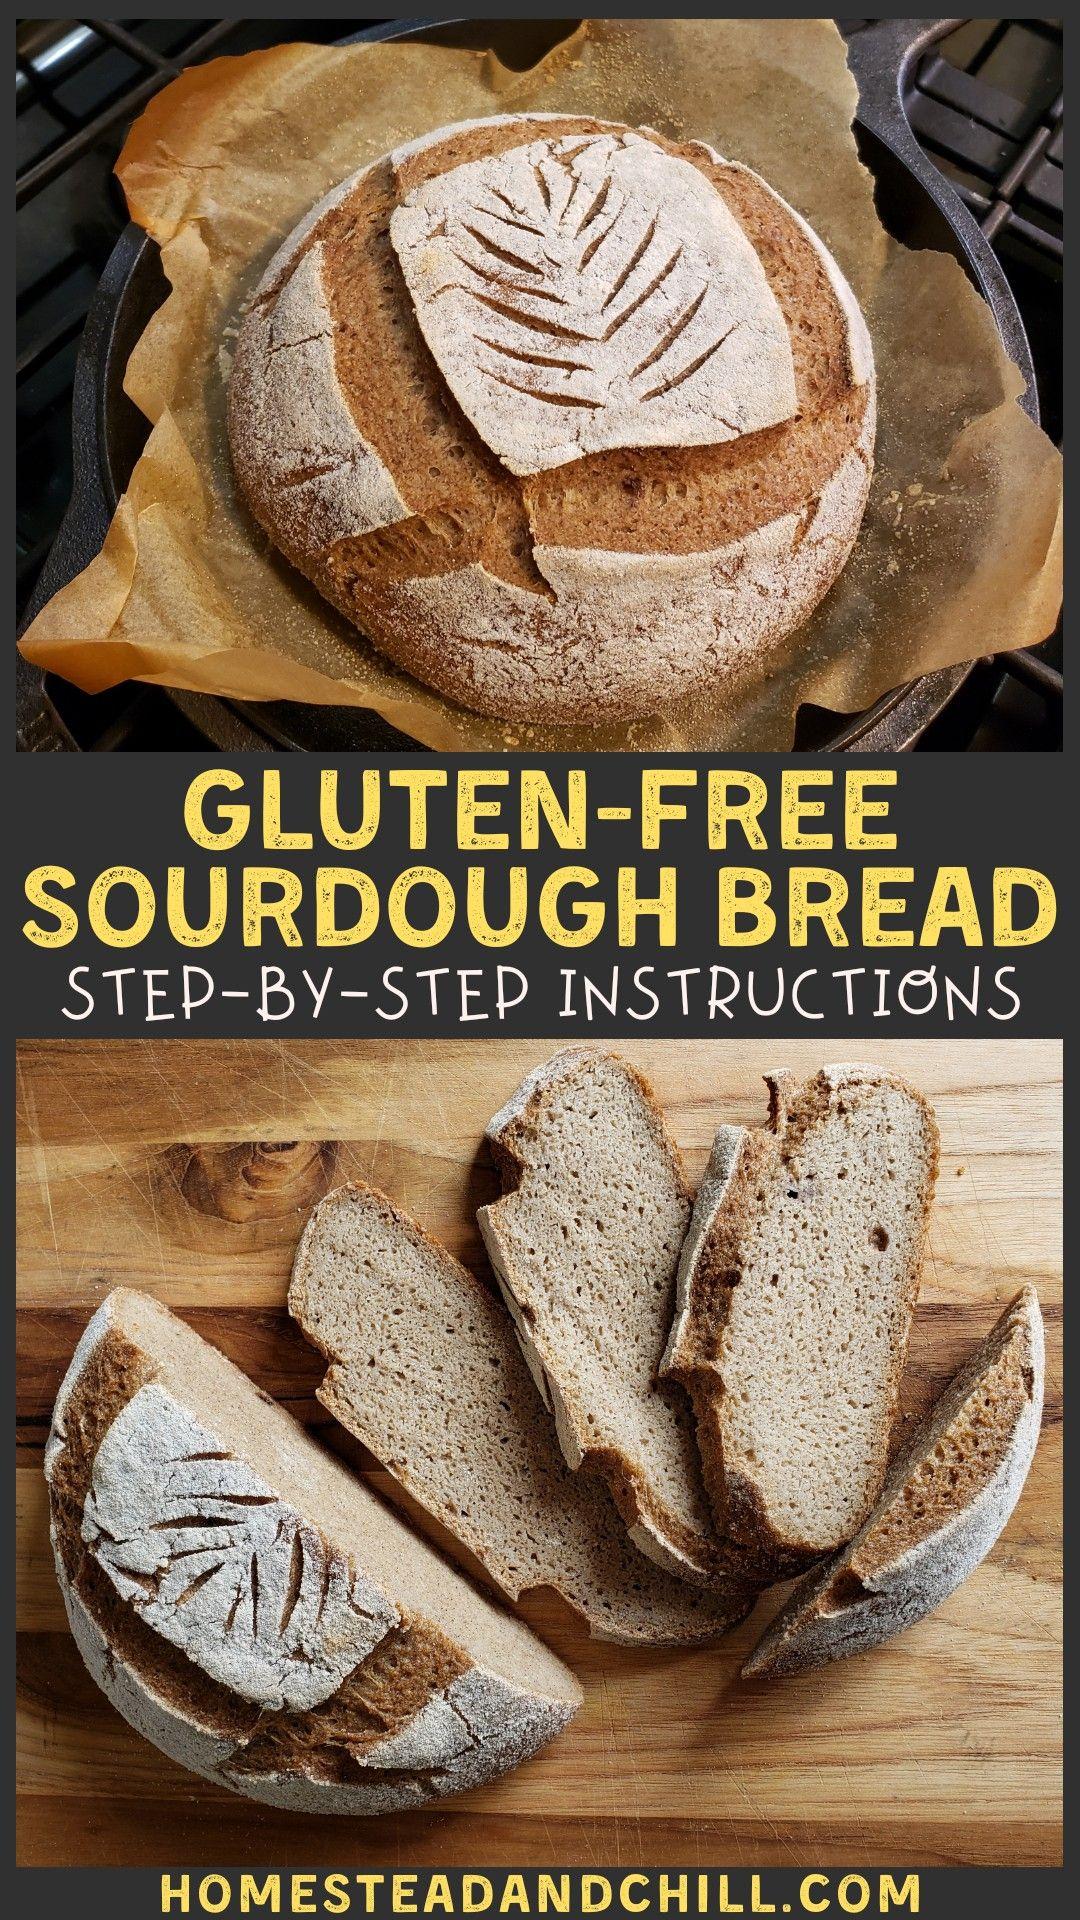 Gluten Free Sourdough Bread Recipe Boule Loaf Homestead And Chill Recipe In 2020 Gluten Free Sourdough Gluten Free Sourdough Bread Gluten Free Sourdough Bread Recipe